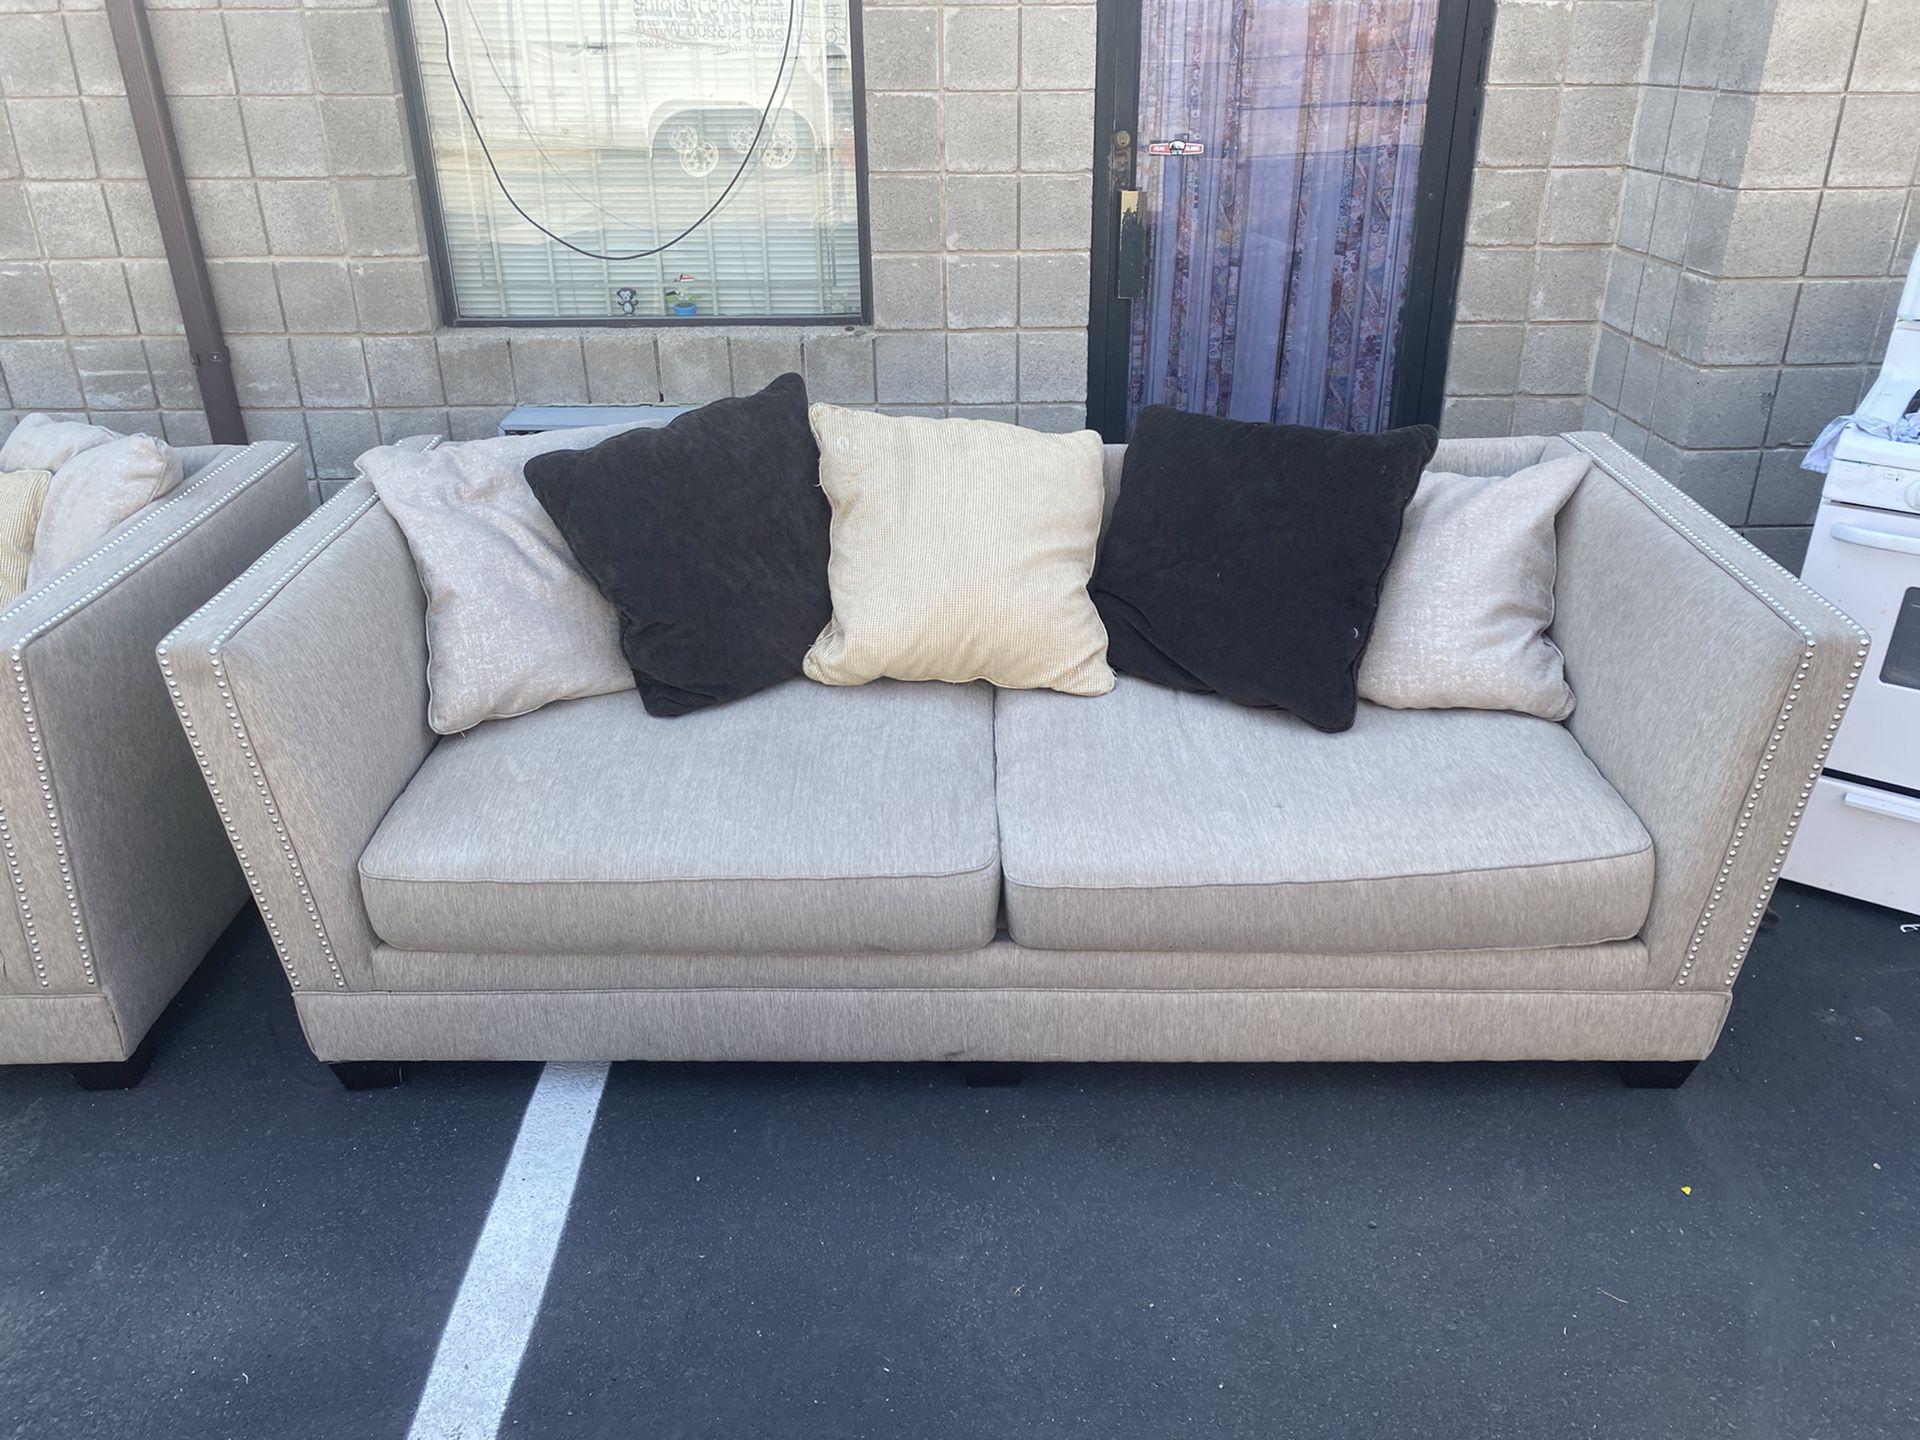 Ashley Furniture Sofa & Love Seat Set